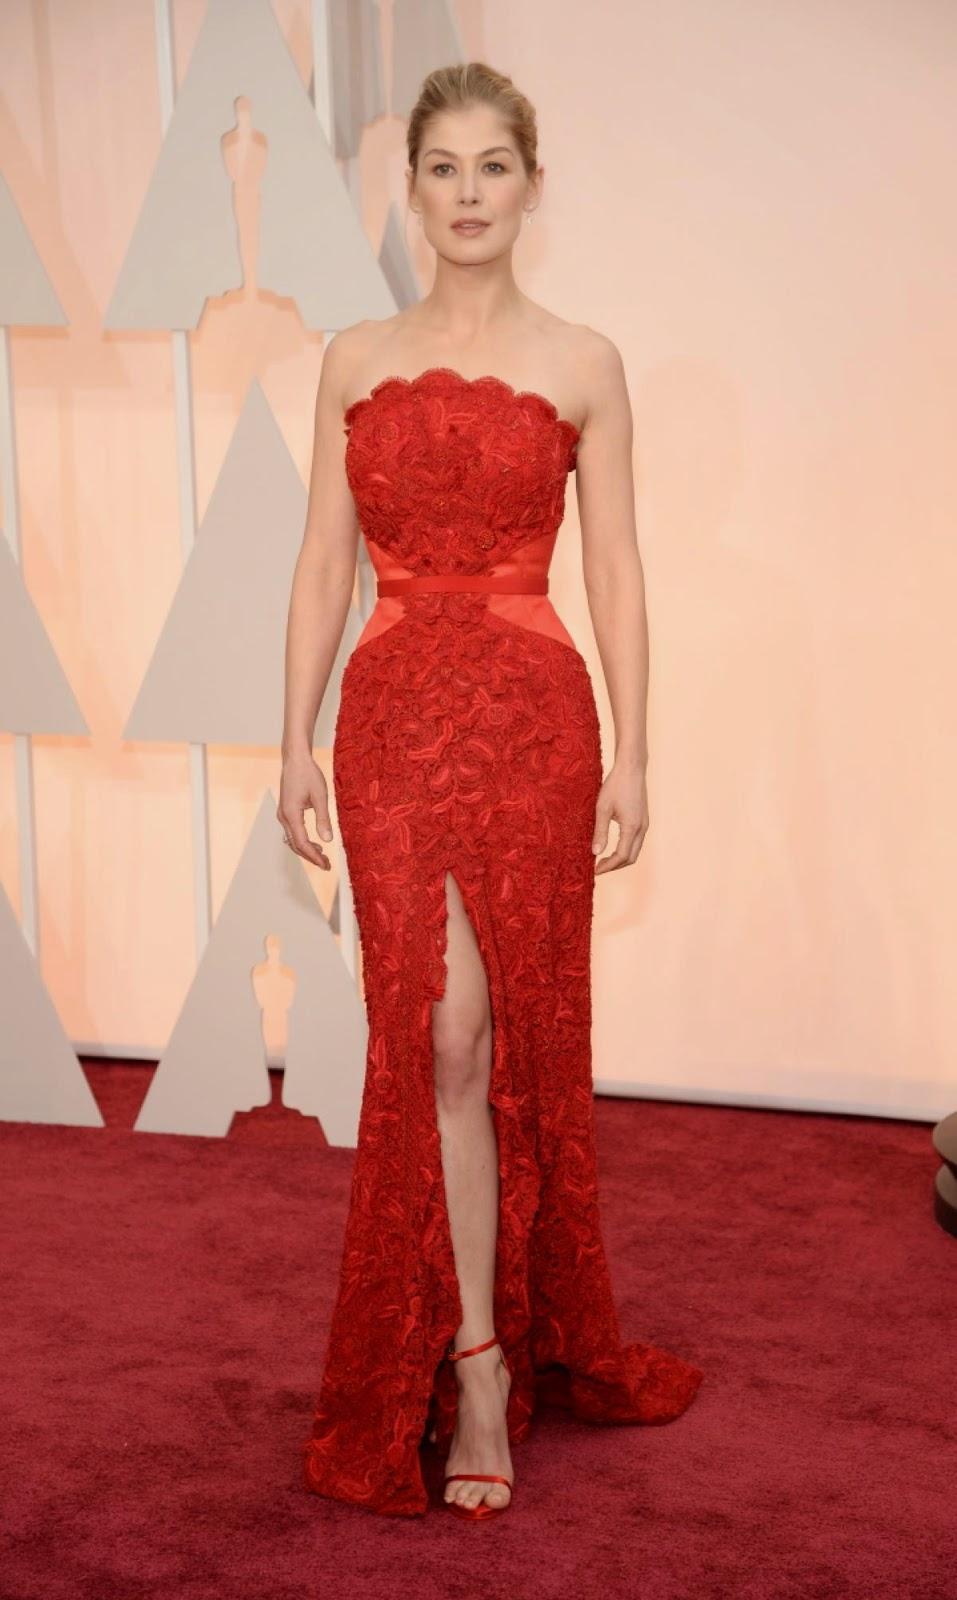 Fashion Show Dress Drop Hot Her dress was jaw dropping